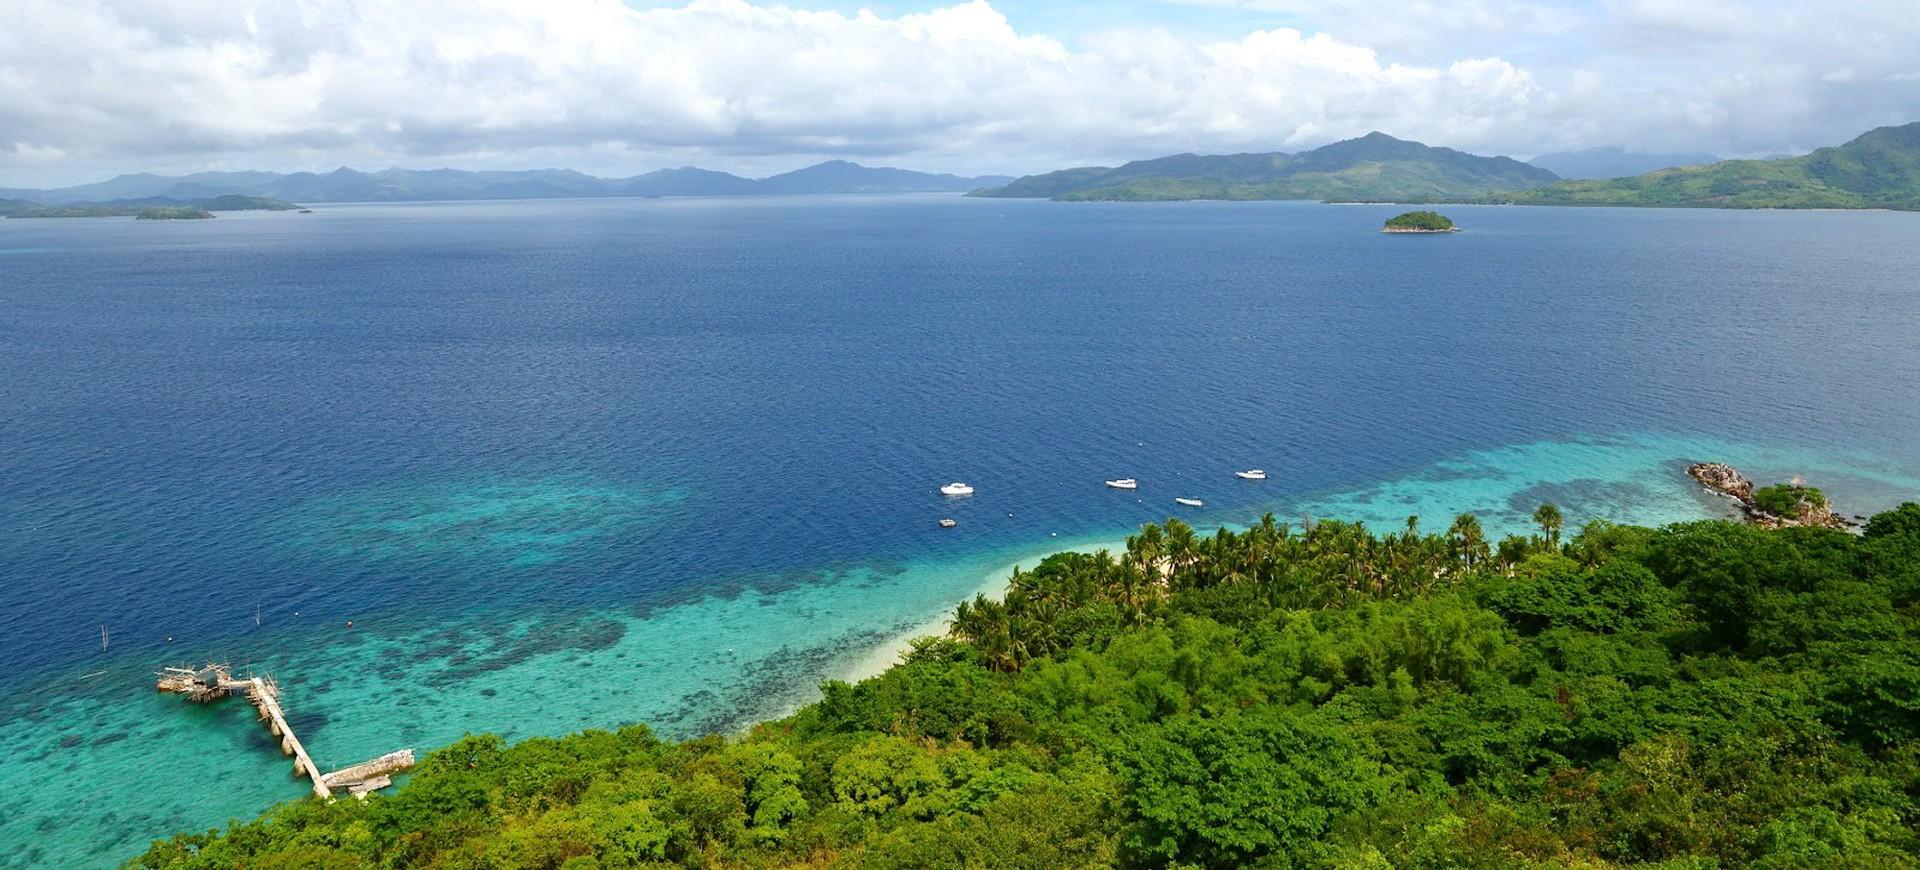 Philippines Ile de Palawan Flower Island